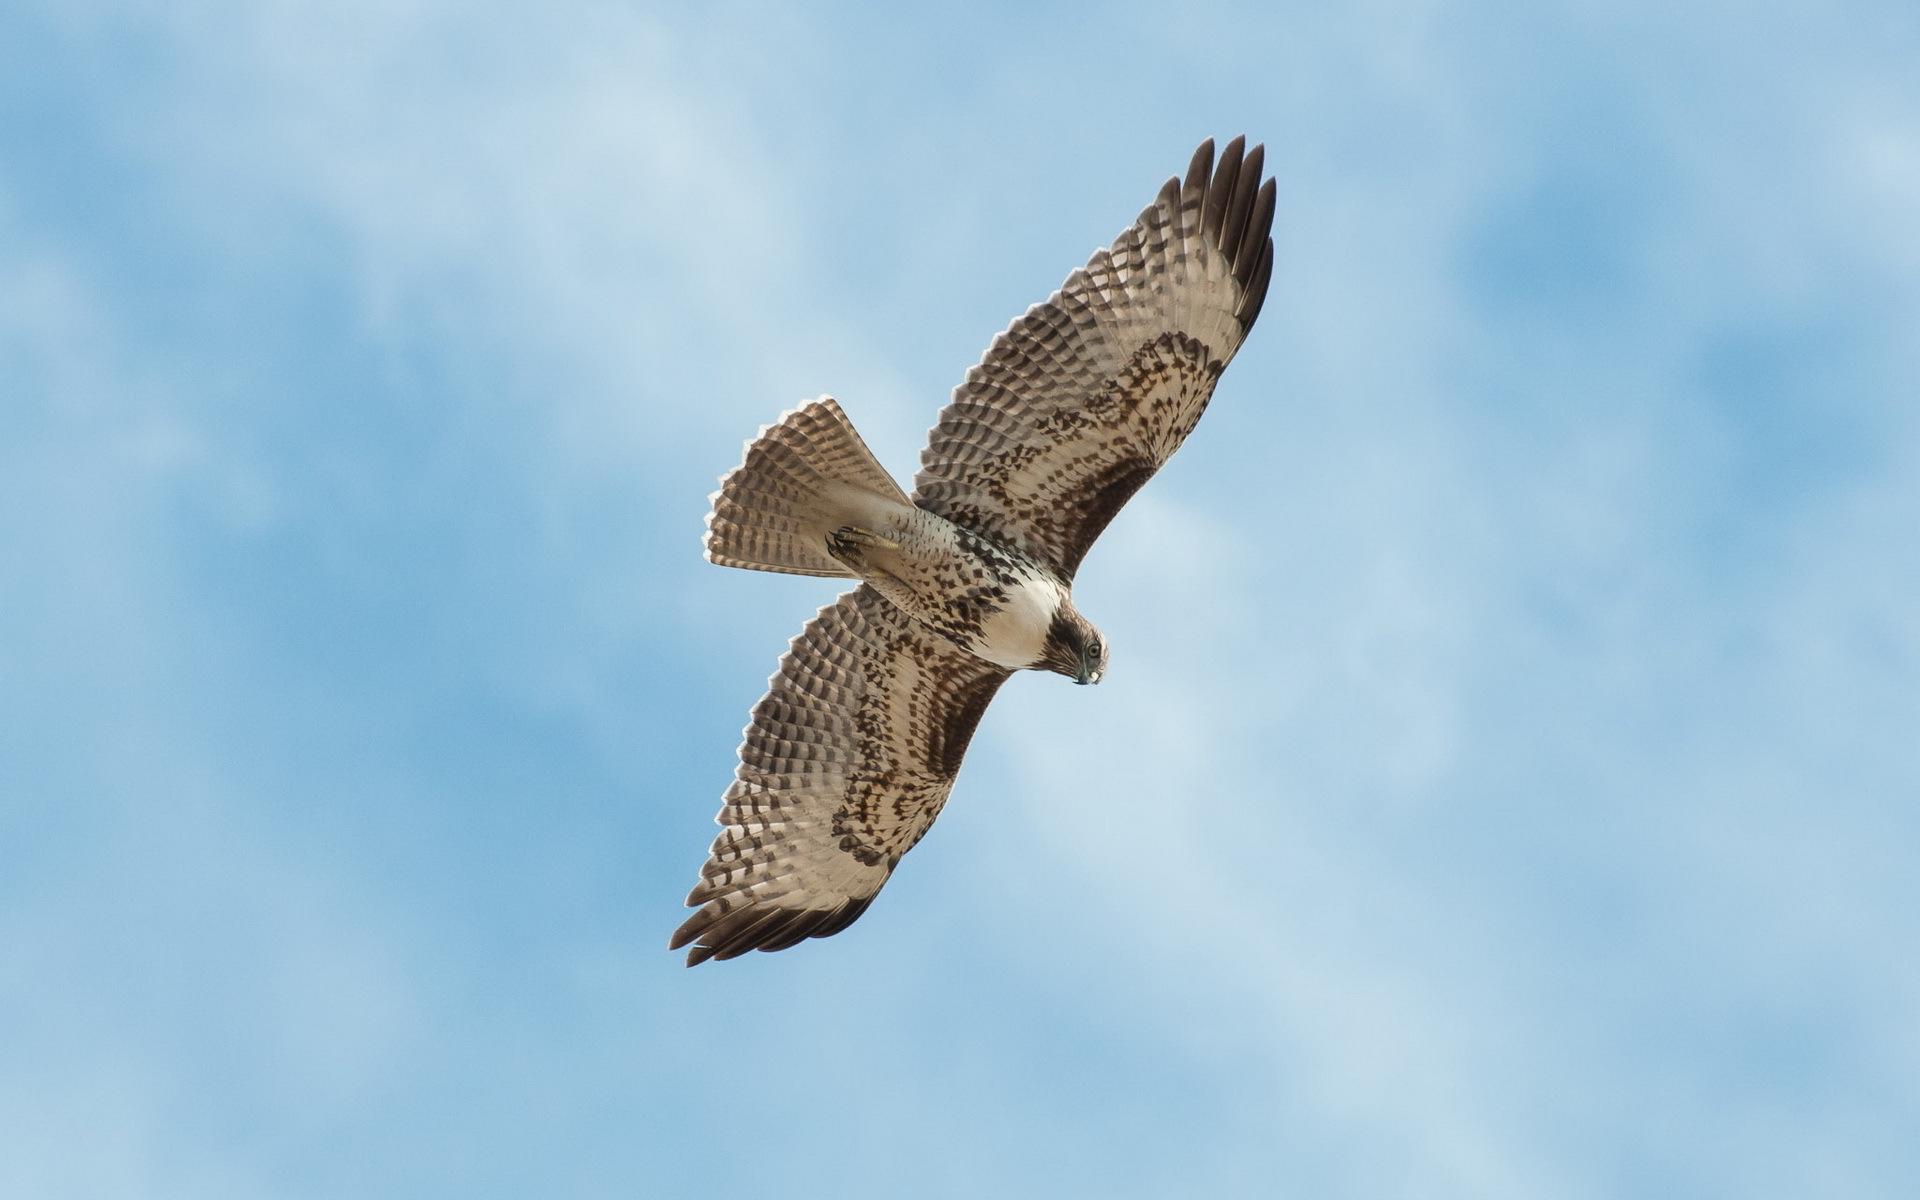 Falcon sky